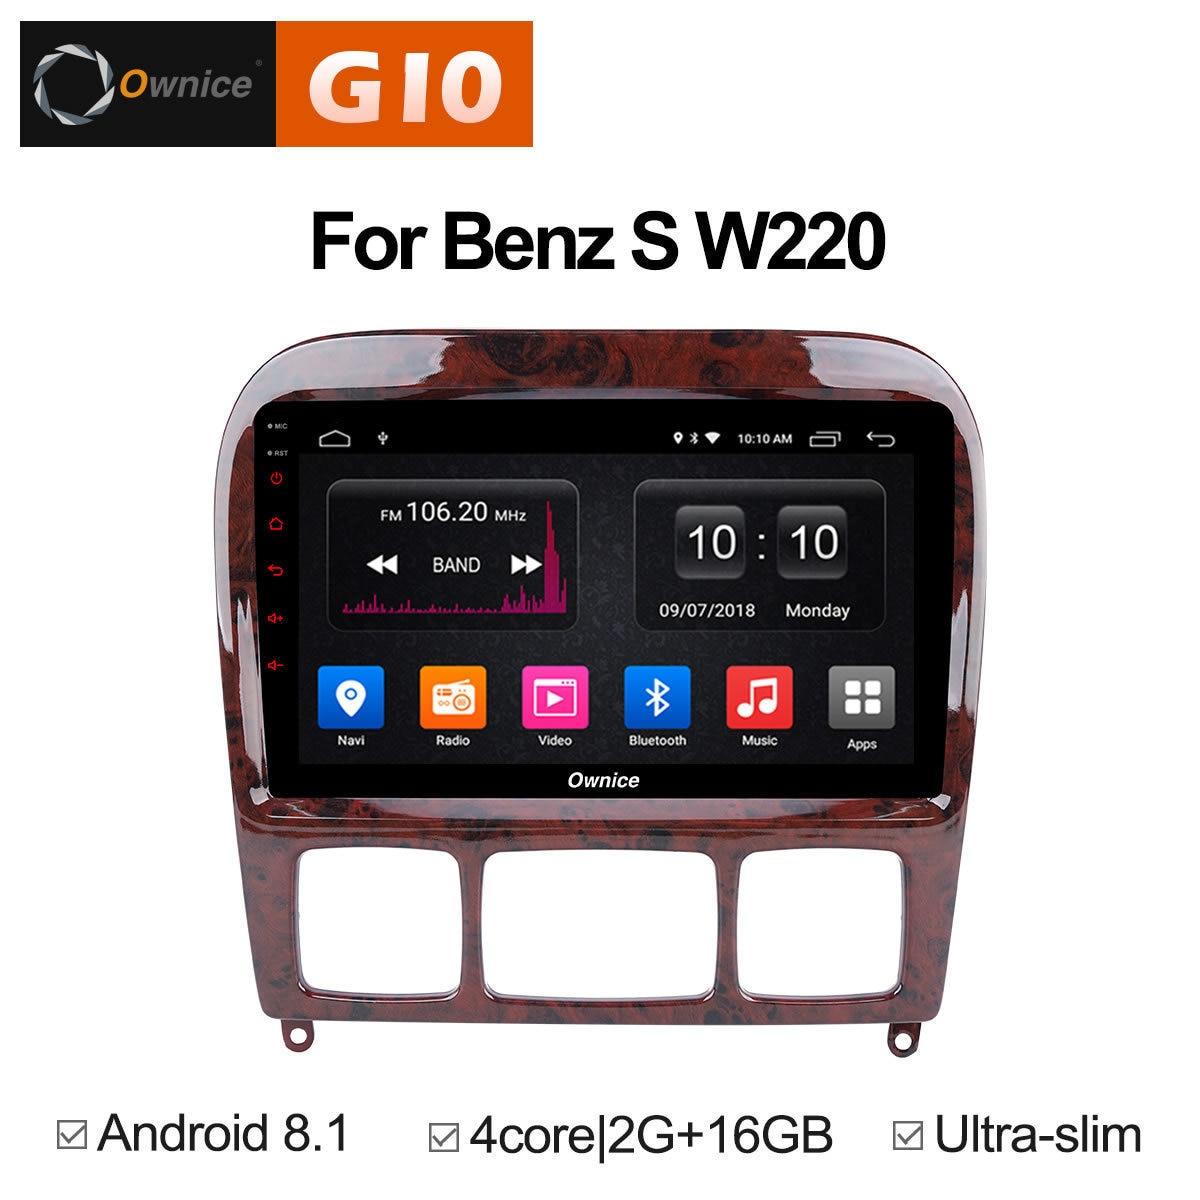 Pour Mercedes/Benz/S280/S320/S350/S400/S500/W220/W215/C S Classe Véhicule Multimédia Android auto 2 din DVD Radio GPS Stéréo Lecteur